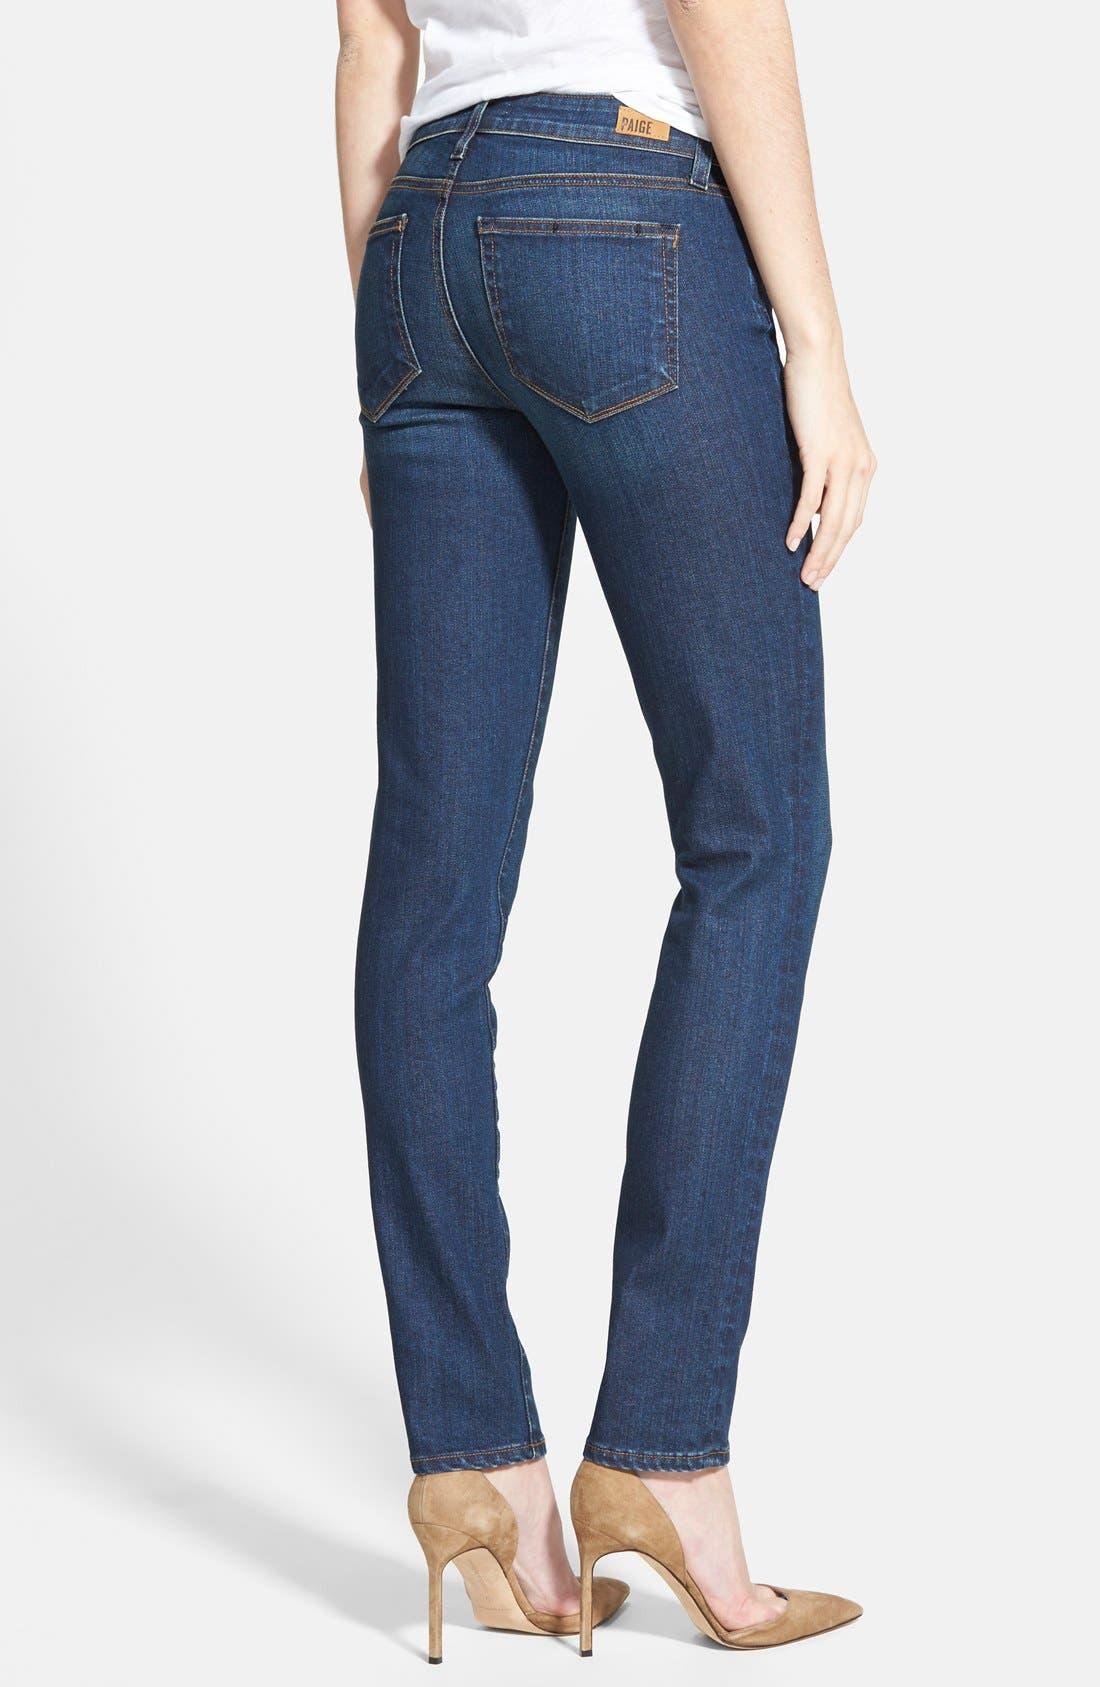 Alternate Image 2  - Paige Denim 'Skyline' Skinny Jeans (Mischa Blue)